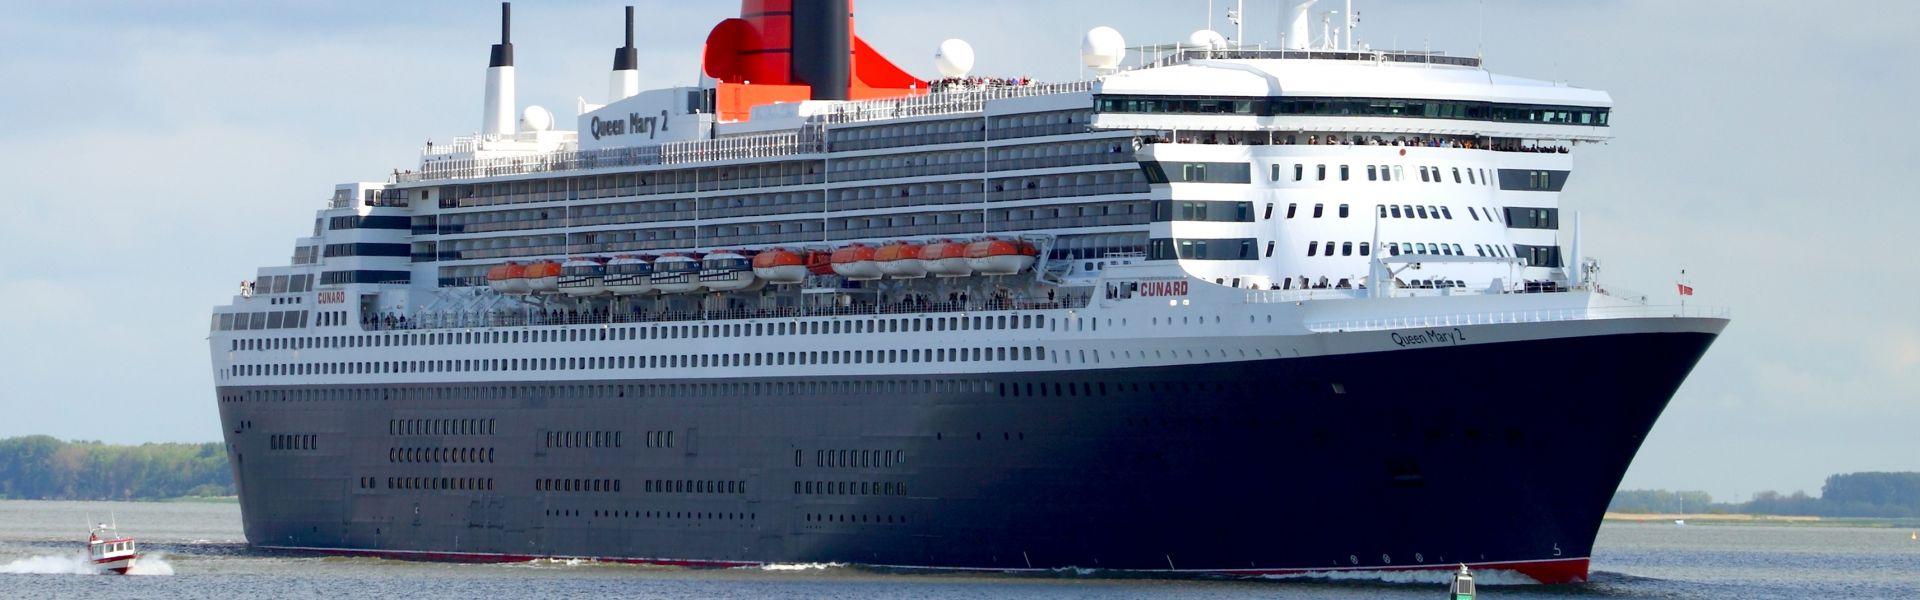 Croaziera 2019 - Asia de Sud (Shanghai) - Cunard Line - Queen Mary 2 - 16 nopti